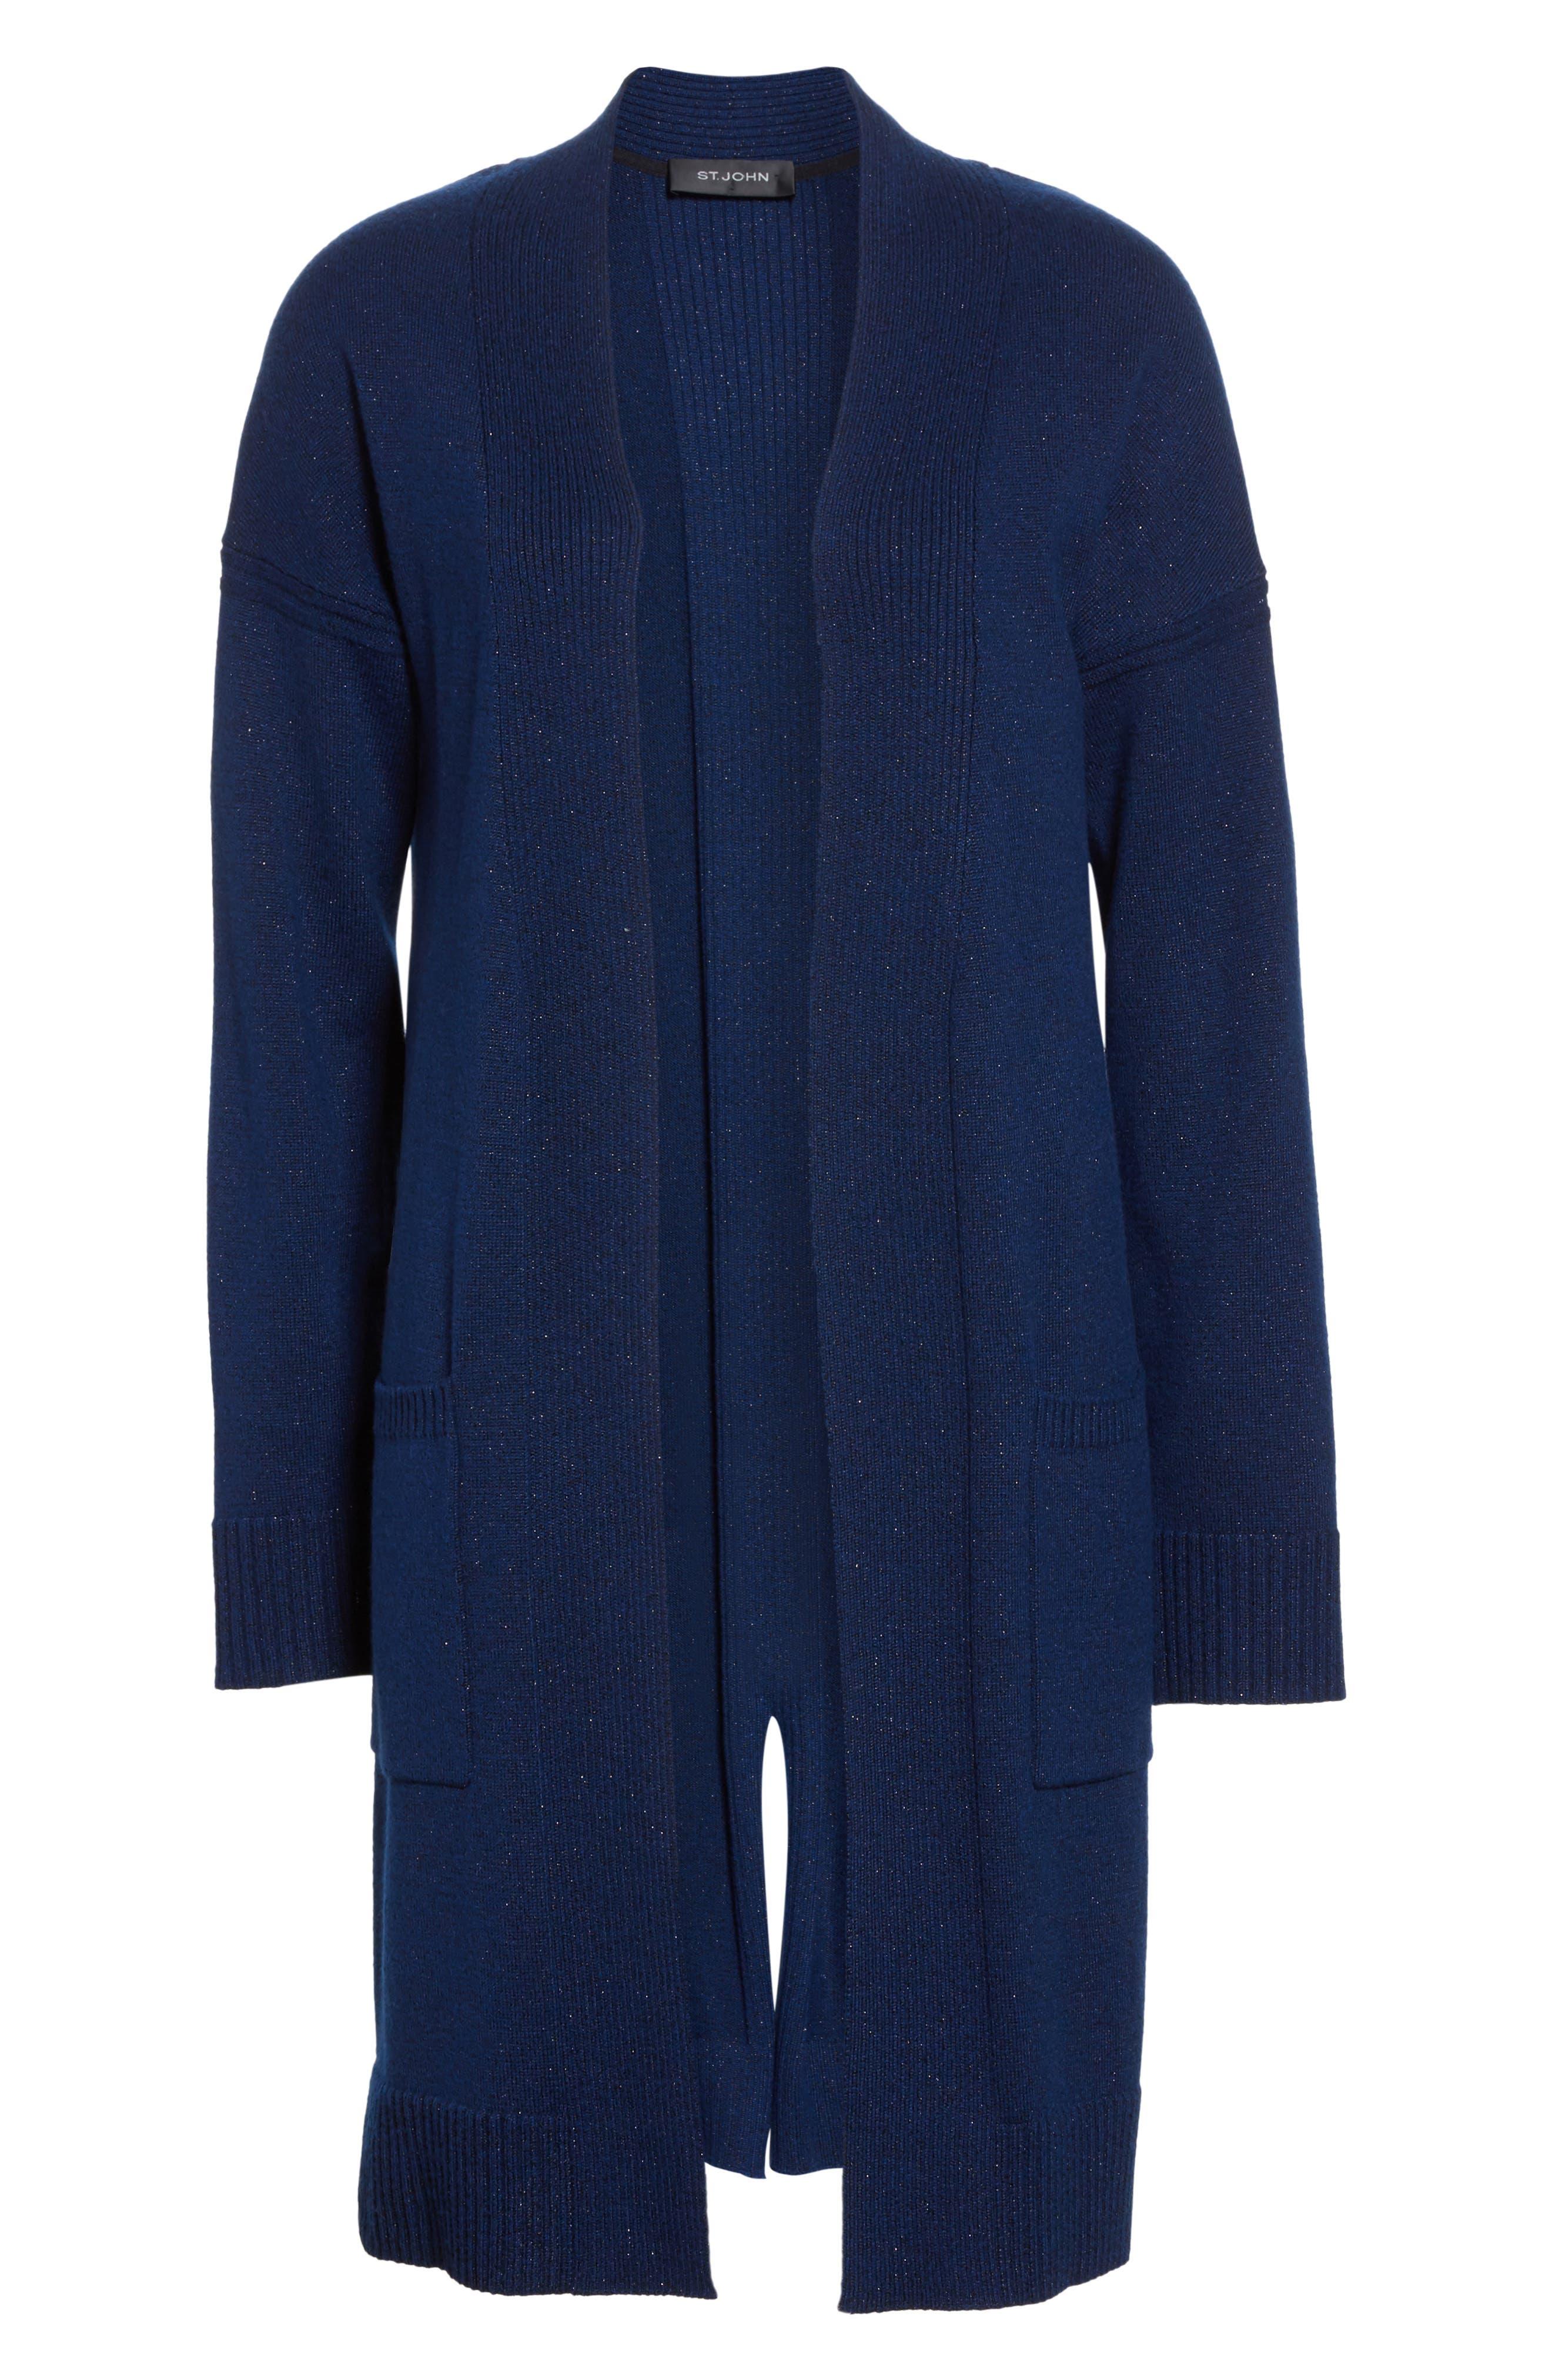 Jersey Cashmere Blend Sparkle Knit Jacket,                             Alternate thumbnail 5, color,                             410